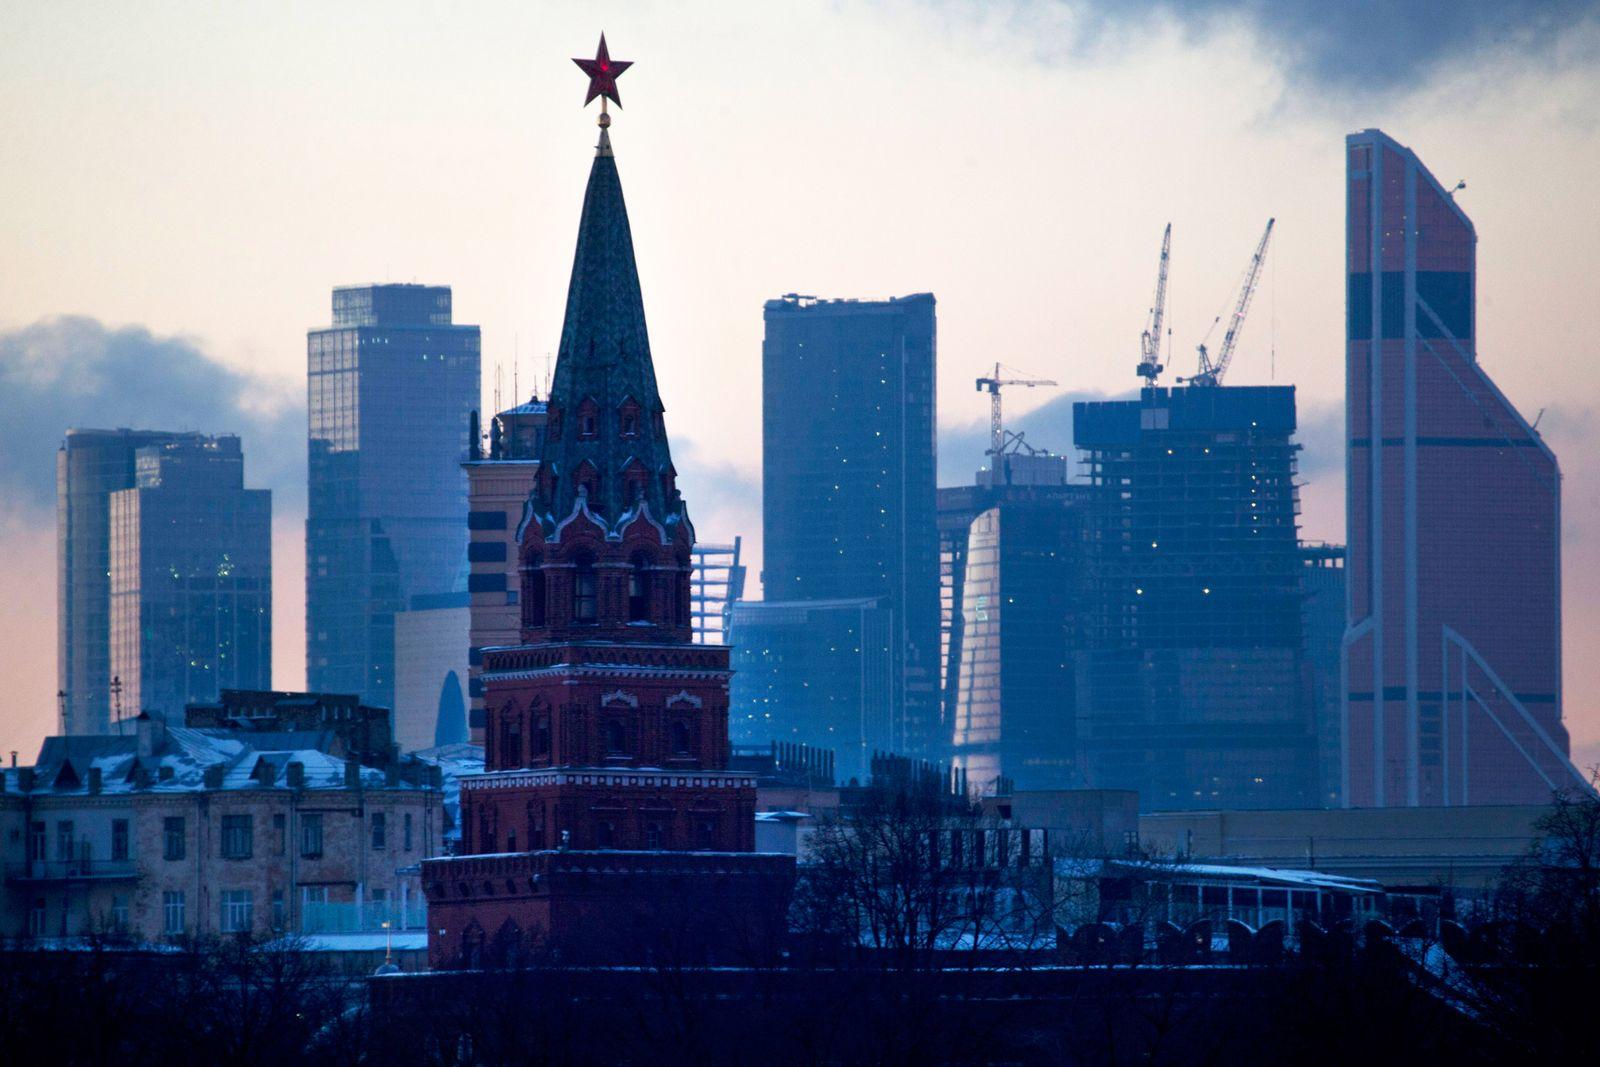 Russland / Moskau / Banken-Viertel / Kreml-Turm / Konjunktur